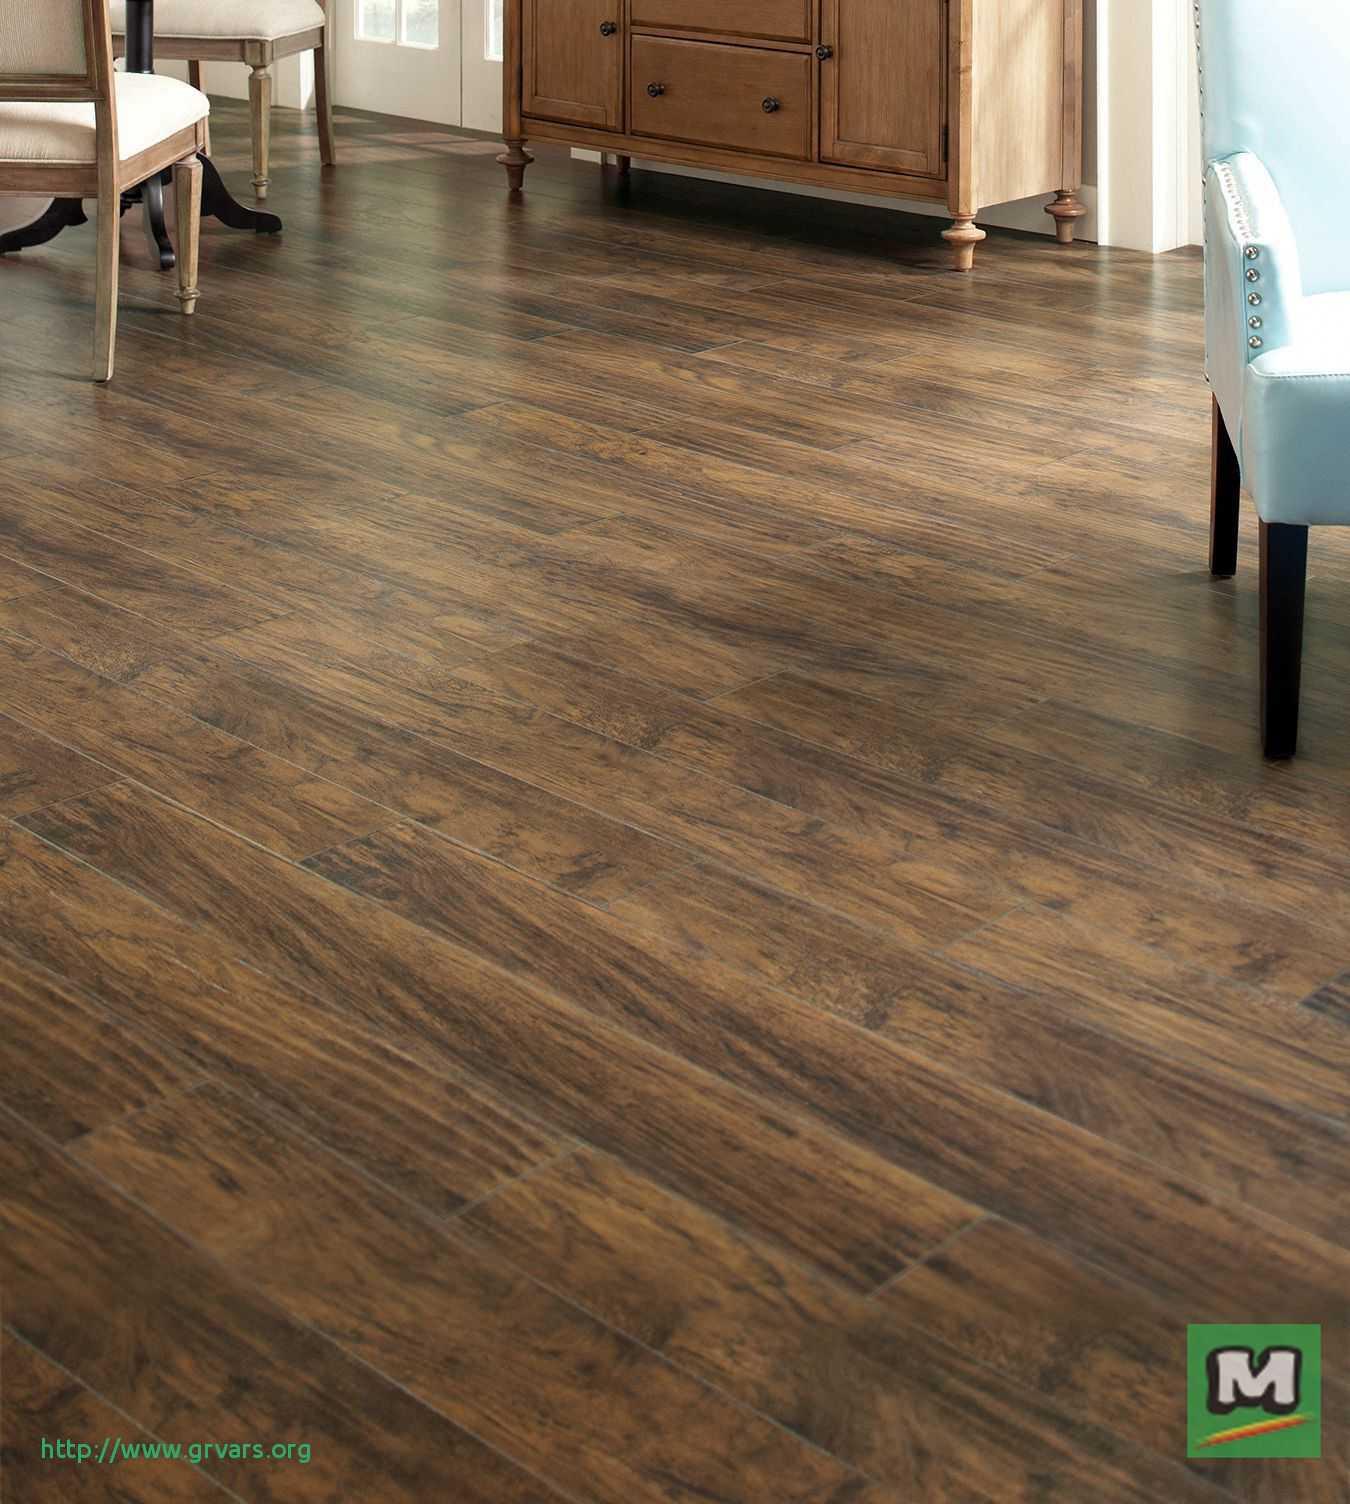 16 Awesome Laminate Flooring Vs